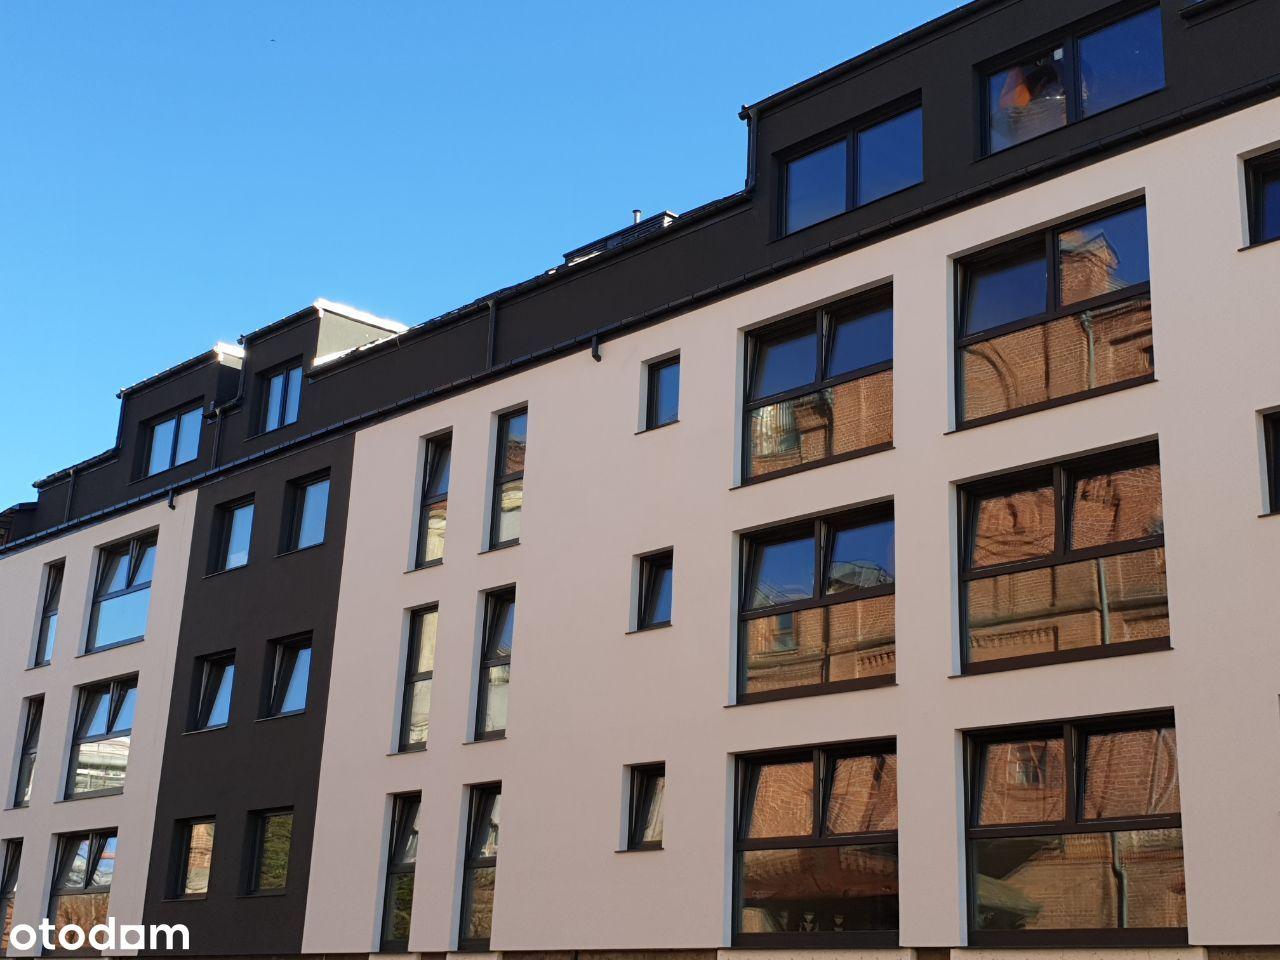 Mieszkania - Grunwaldzka 14 Koszalin